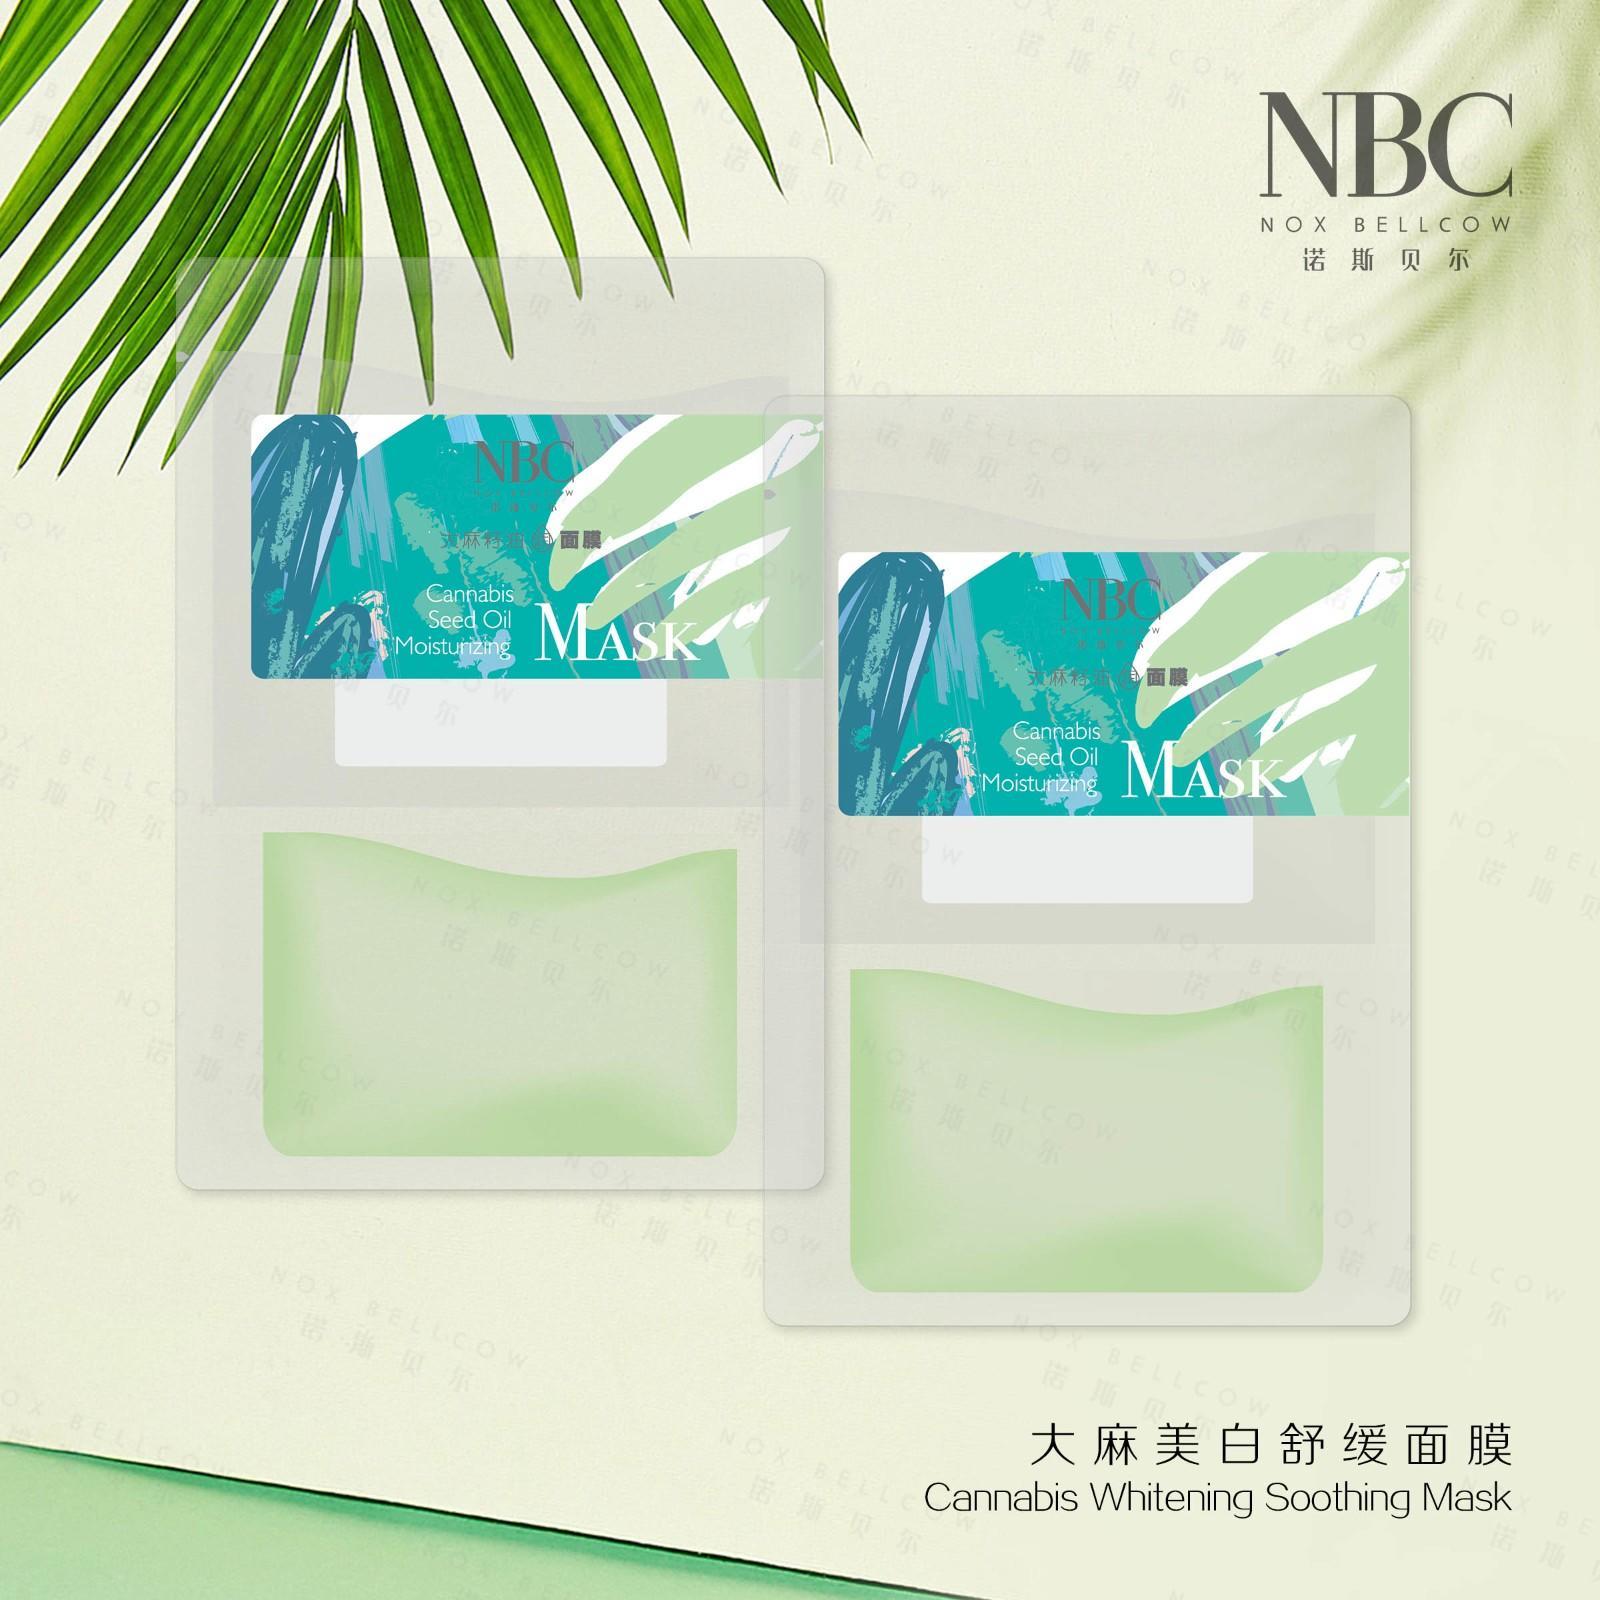 essence skin care for skincare-3